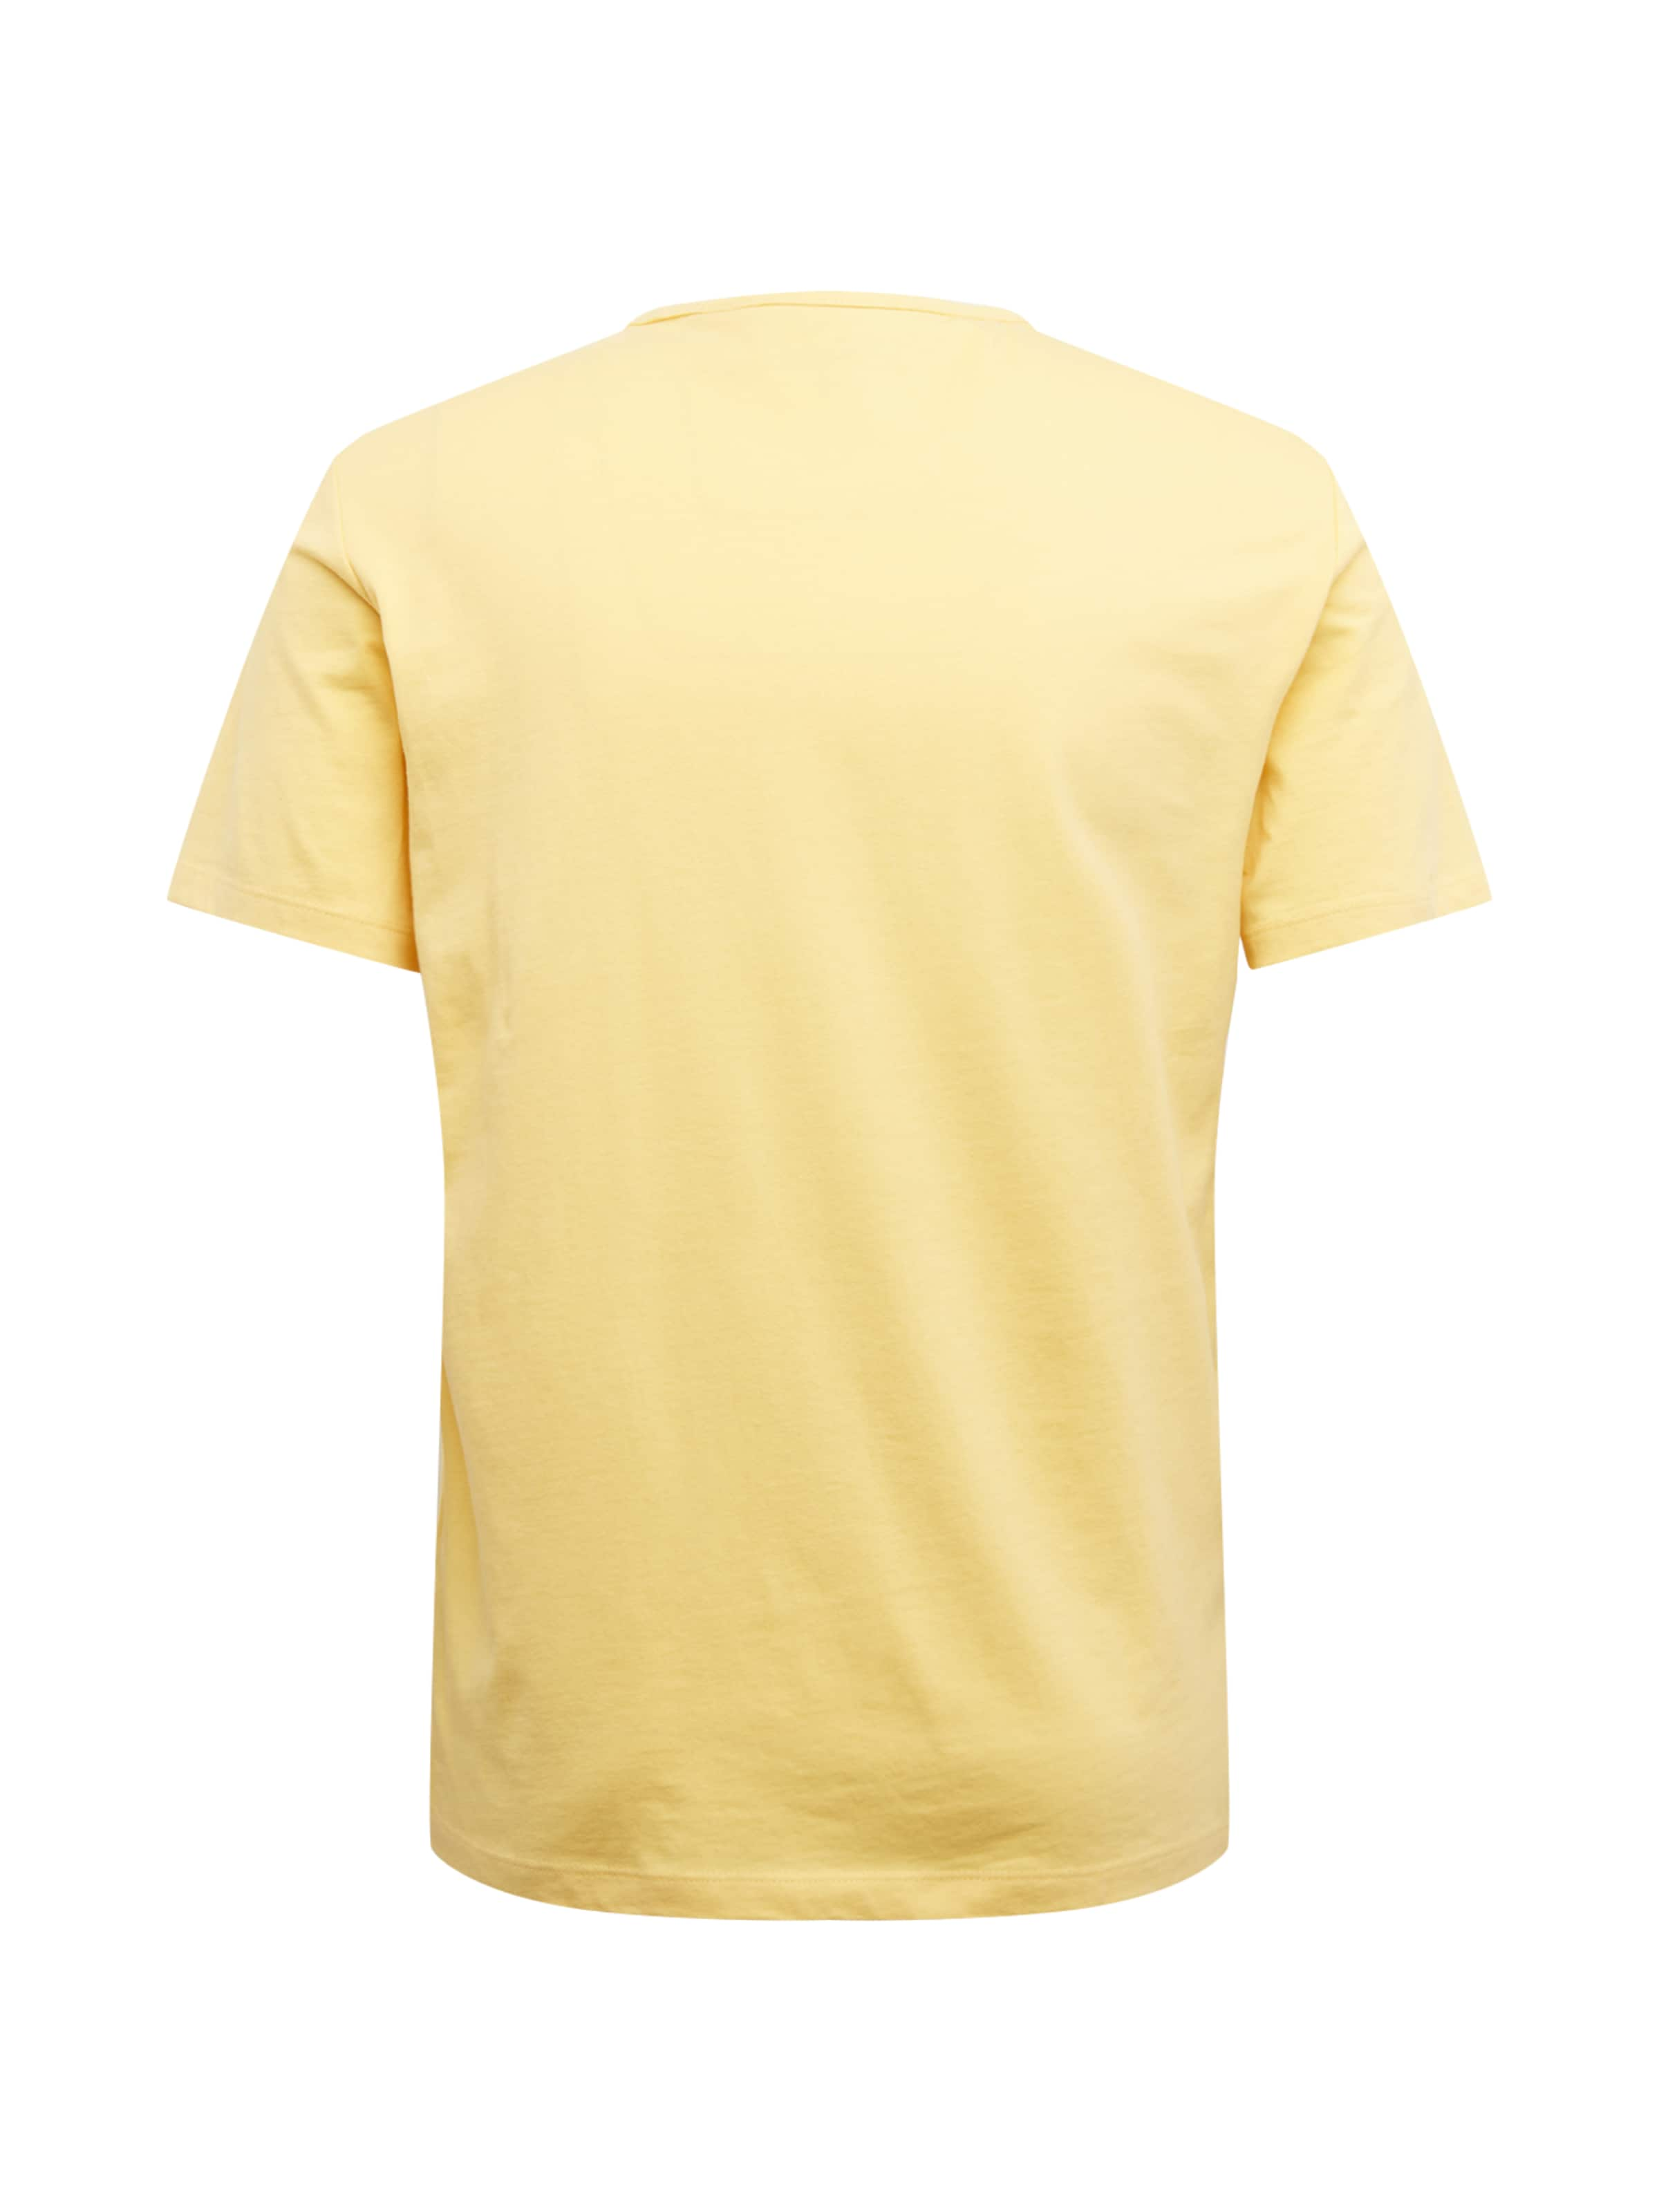 s.Oliver T-Shirt in hellblau / dunkelblau / gelb / weiß Mottoprint 13.004.32.4963.13A1.S